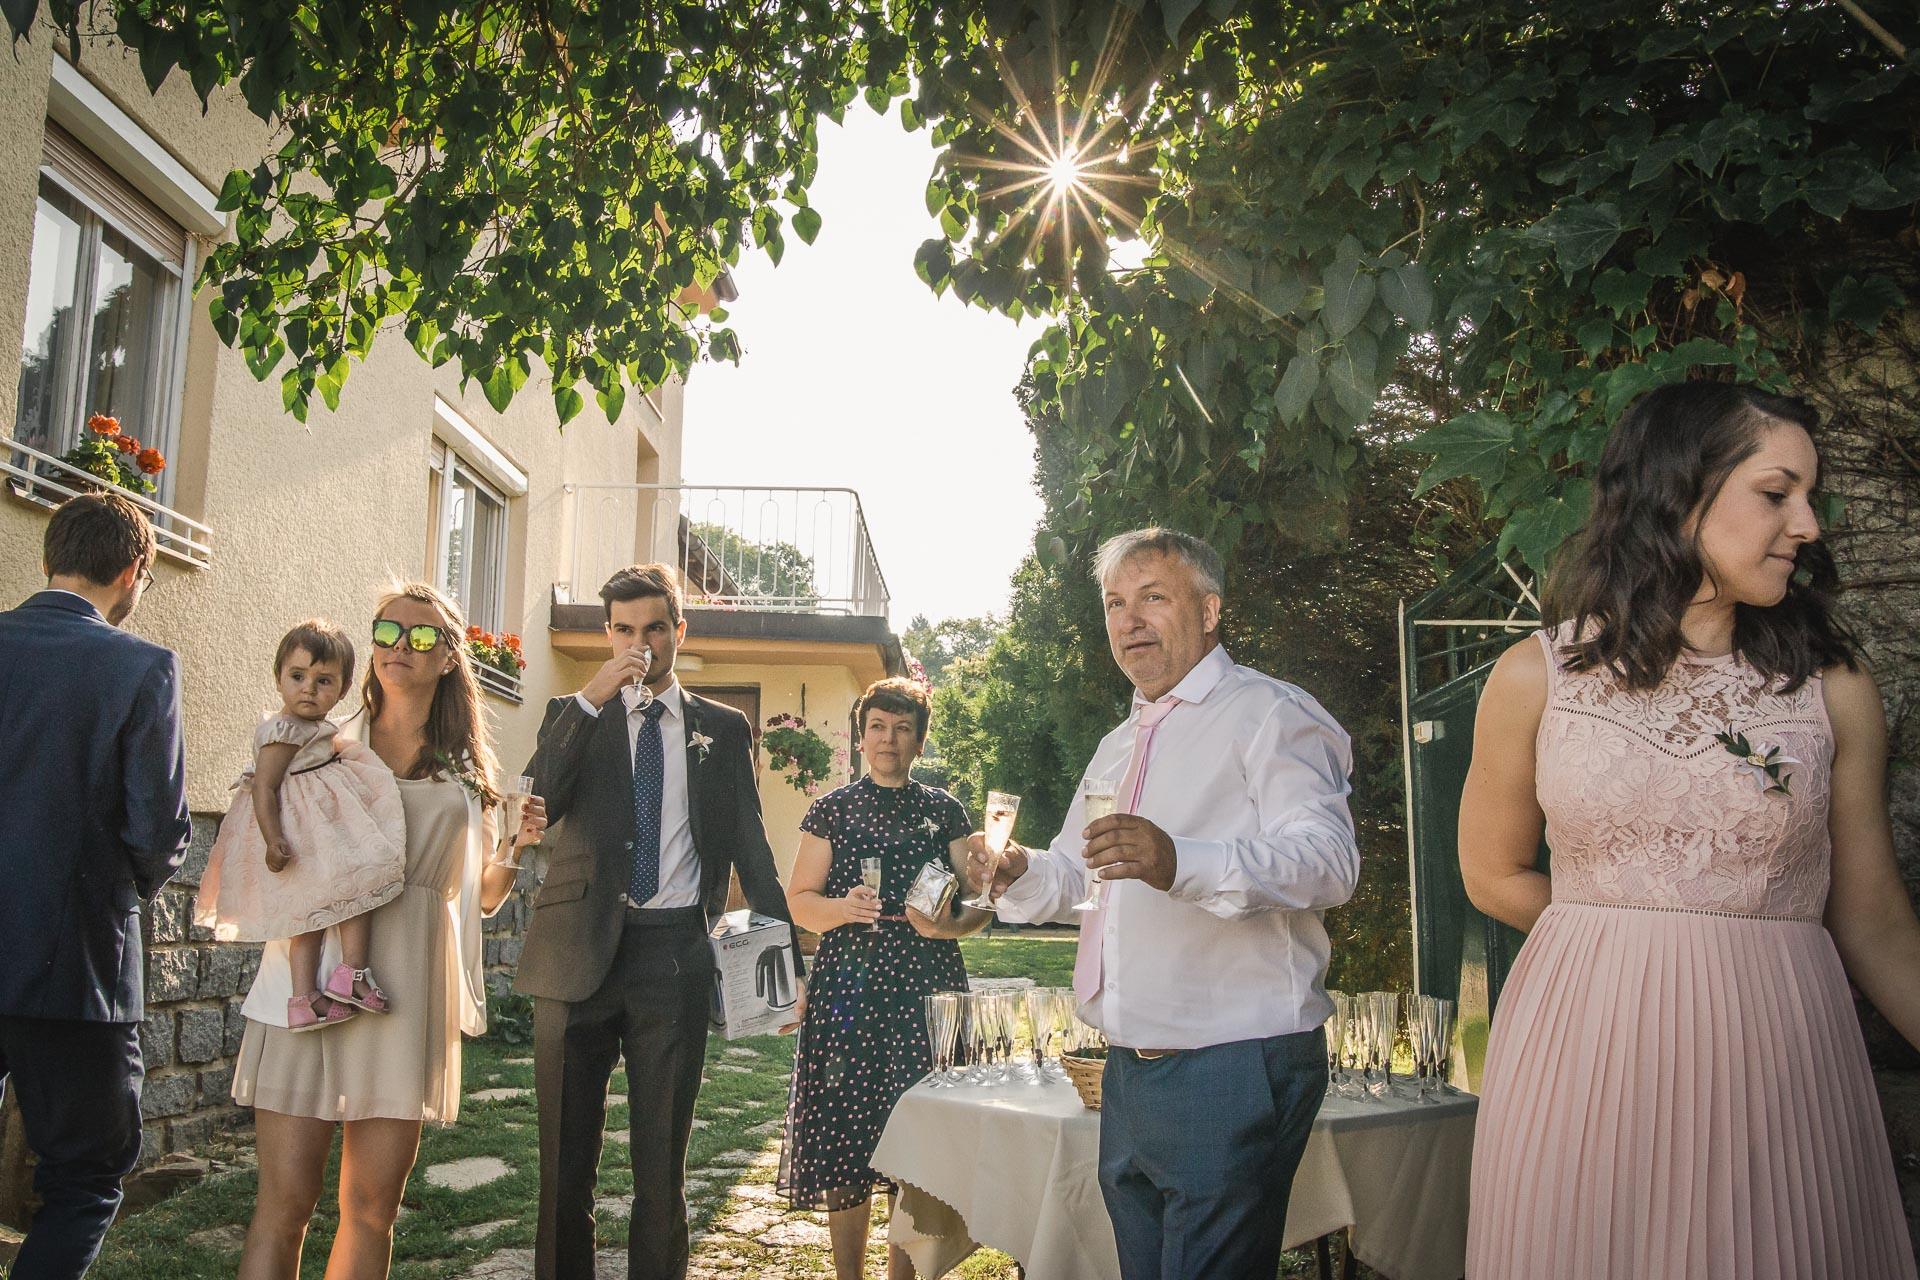 svatební-fotograf-wedding-svatebni-video-orlík-vltava-kostel-statek-stodola-boho-svatba-Beautyfoto-47